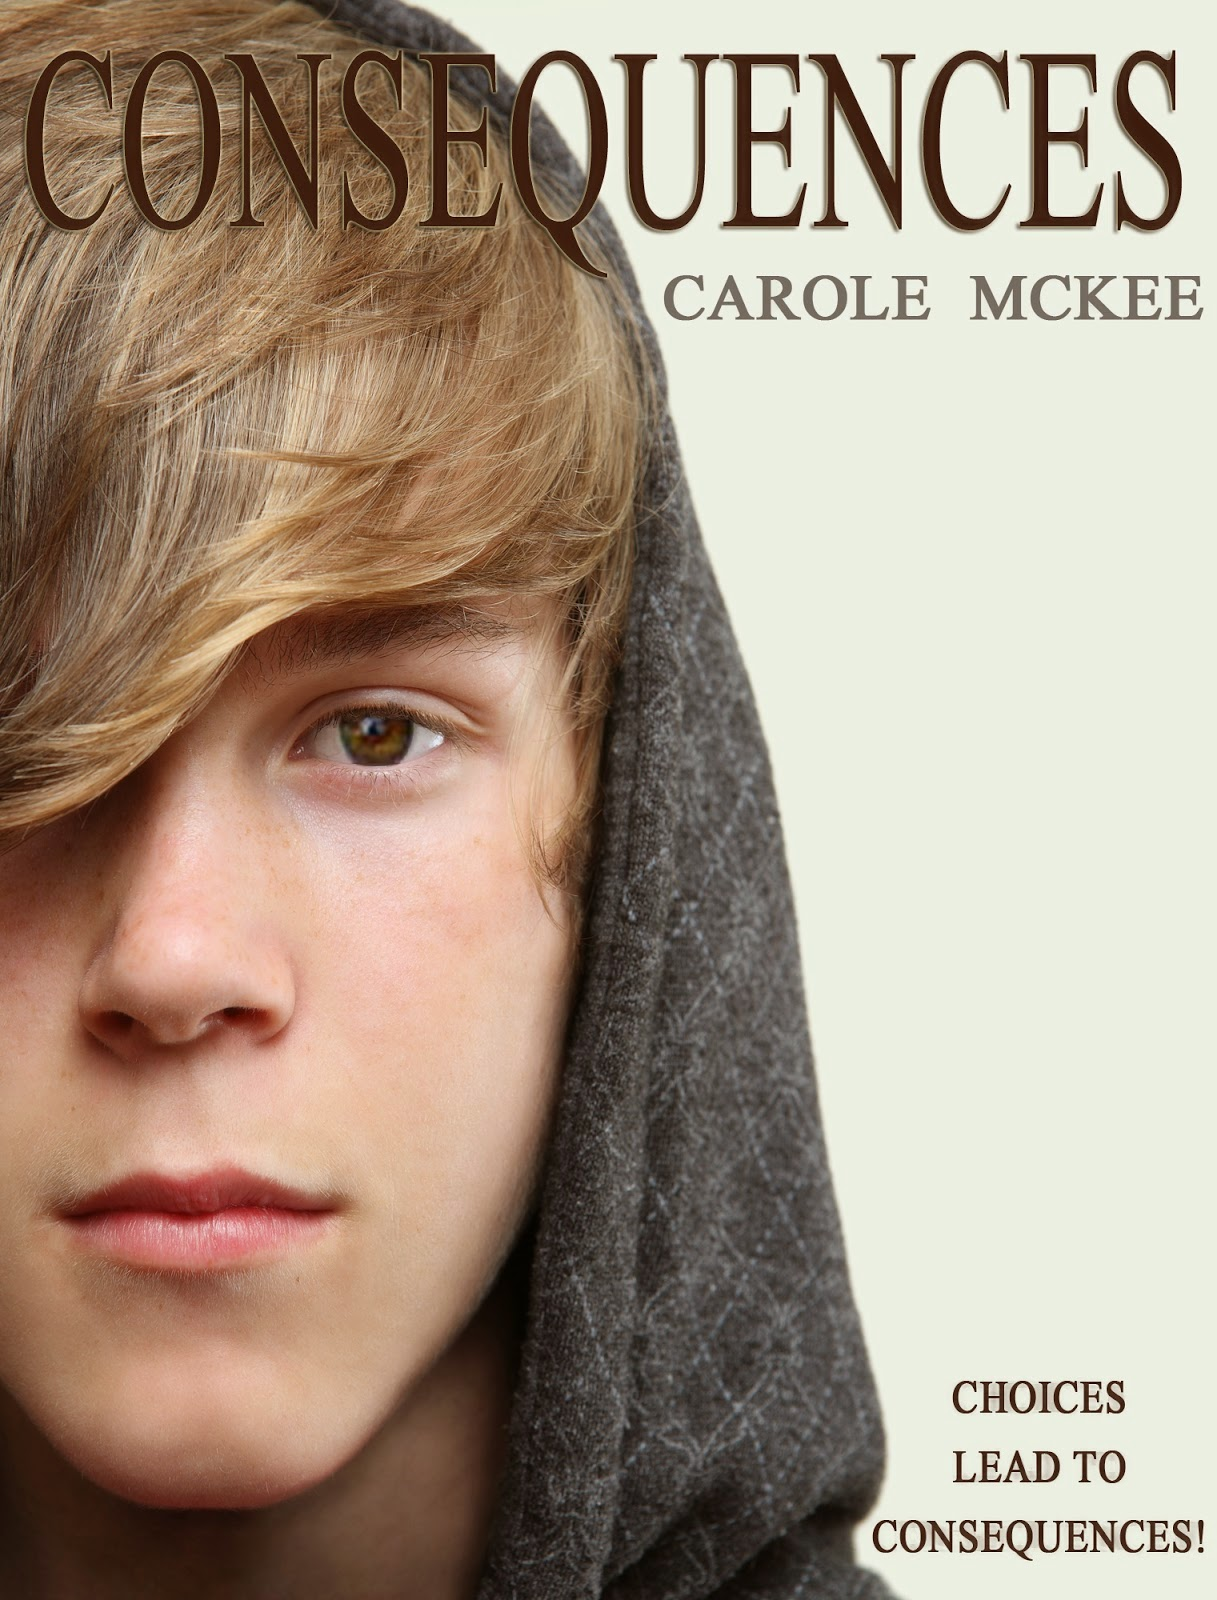 http://www.amazon.com/Consequences-Choices-Book-Carole-McKee-ebook/dp/B00CLY267I/ref=sr_1_3?s=books&ie=UTF8&qid=1405381141&sr=1-3&keywords=Carole+Mckee